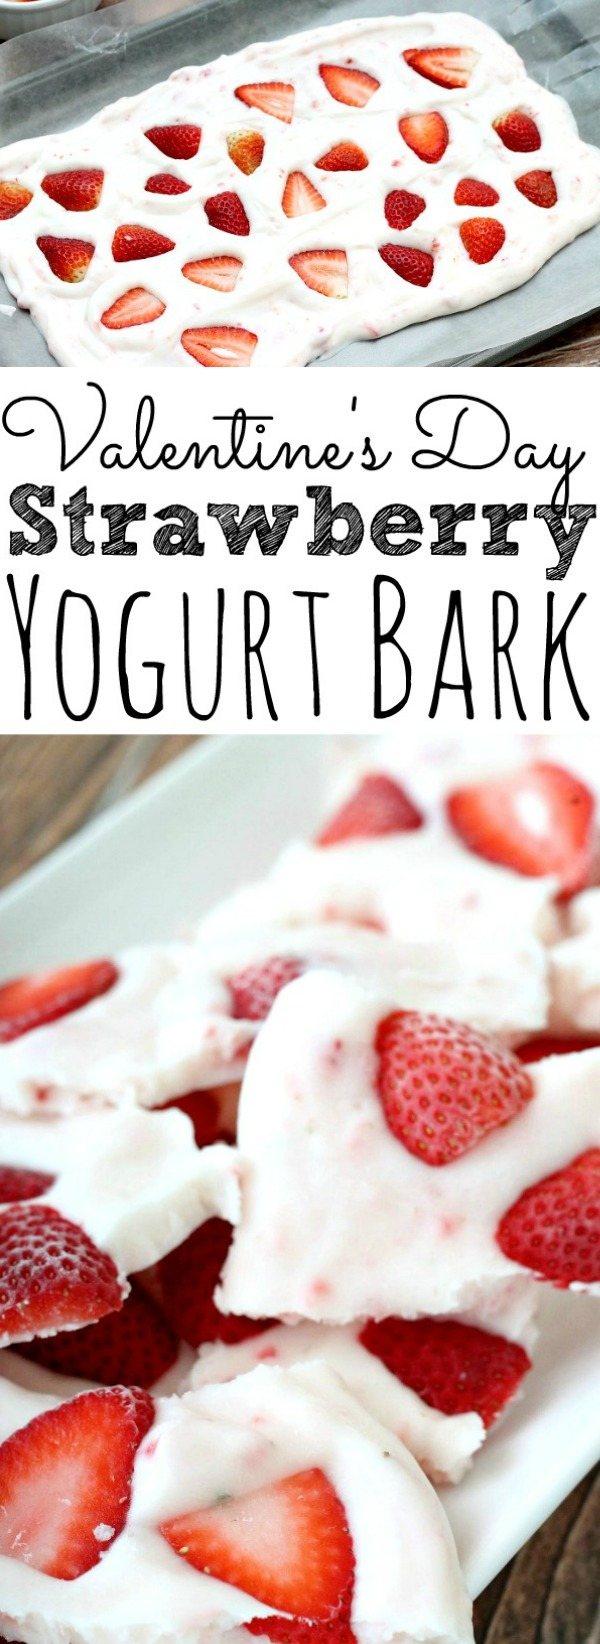 Strawberry Yogurt Bark Recipe